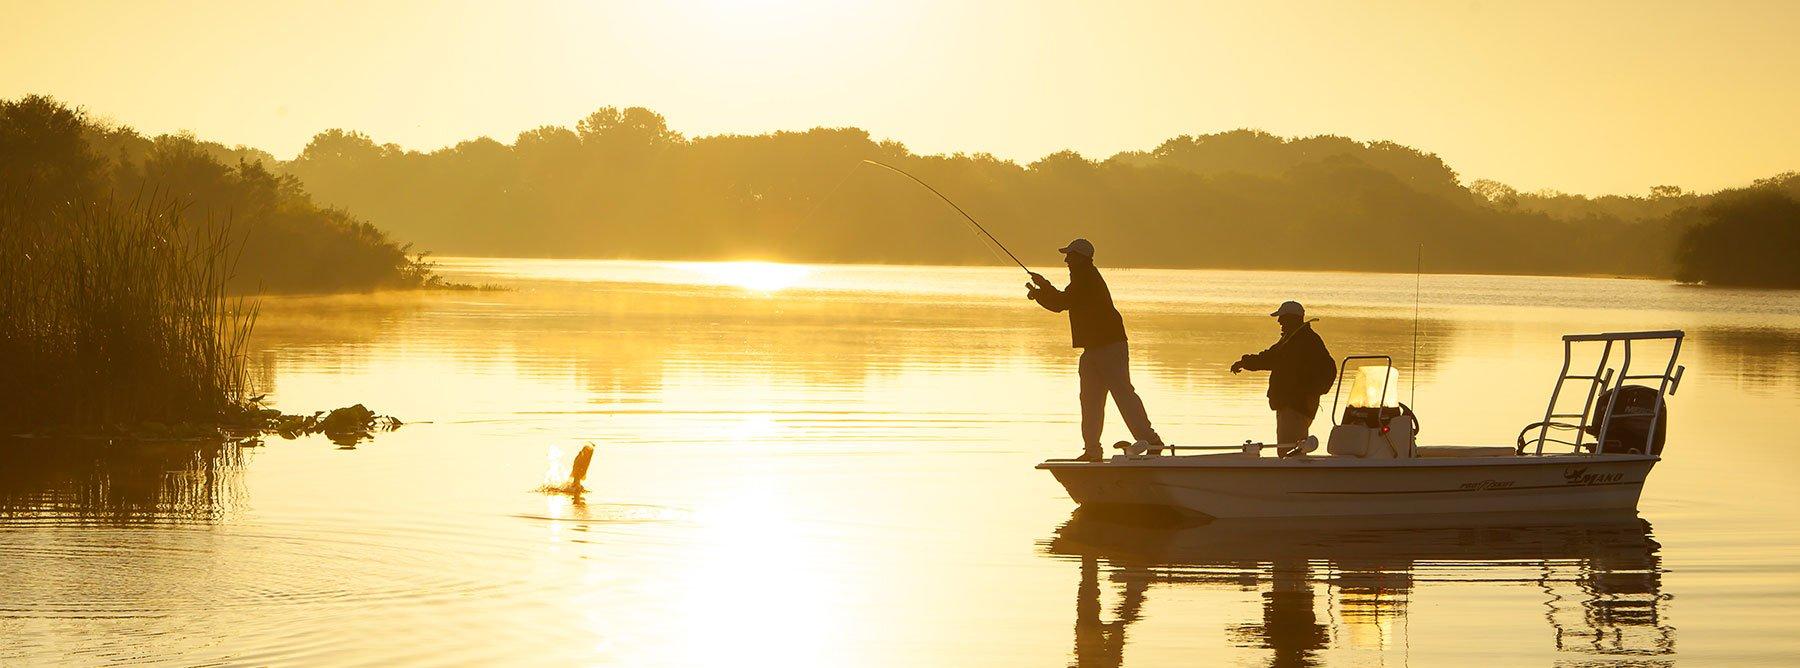 Ribolov na fotkama - Page 10 Header-bass-fishing